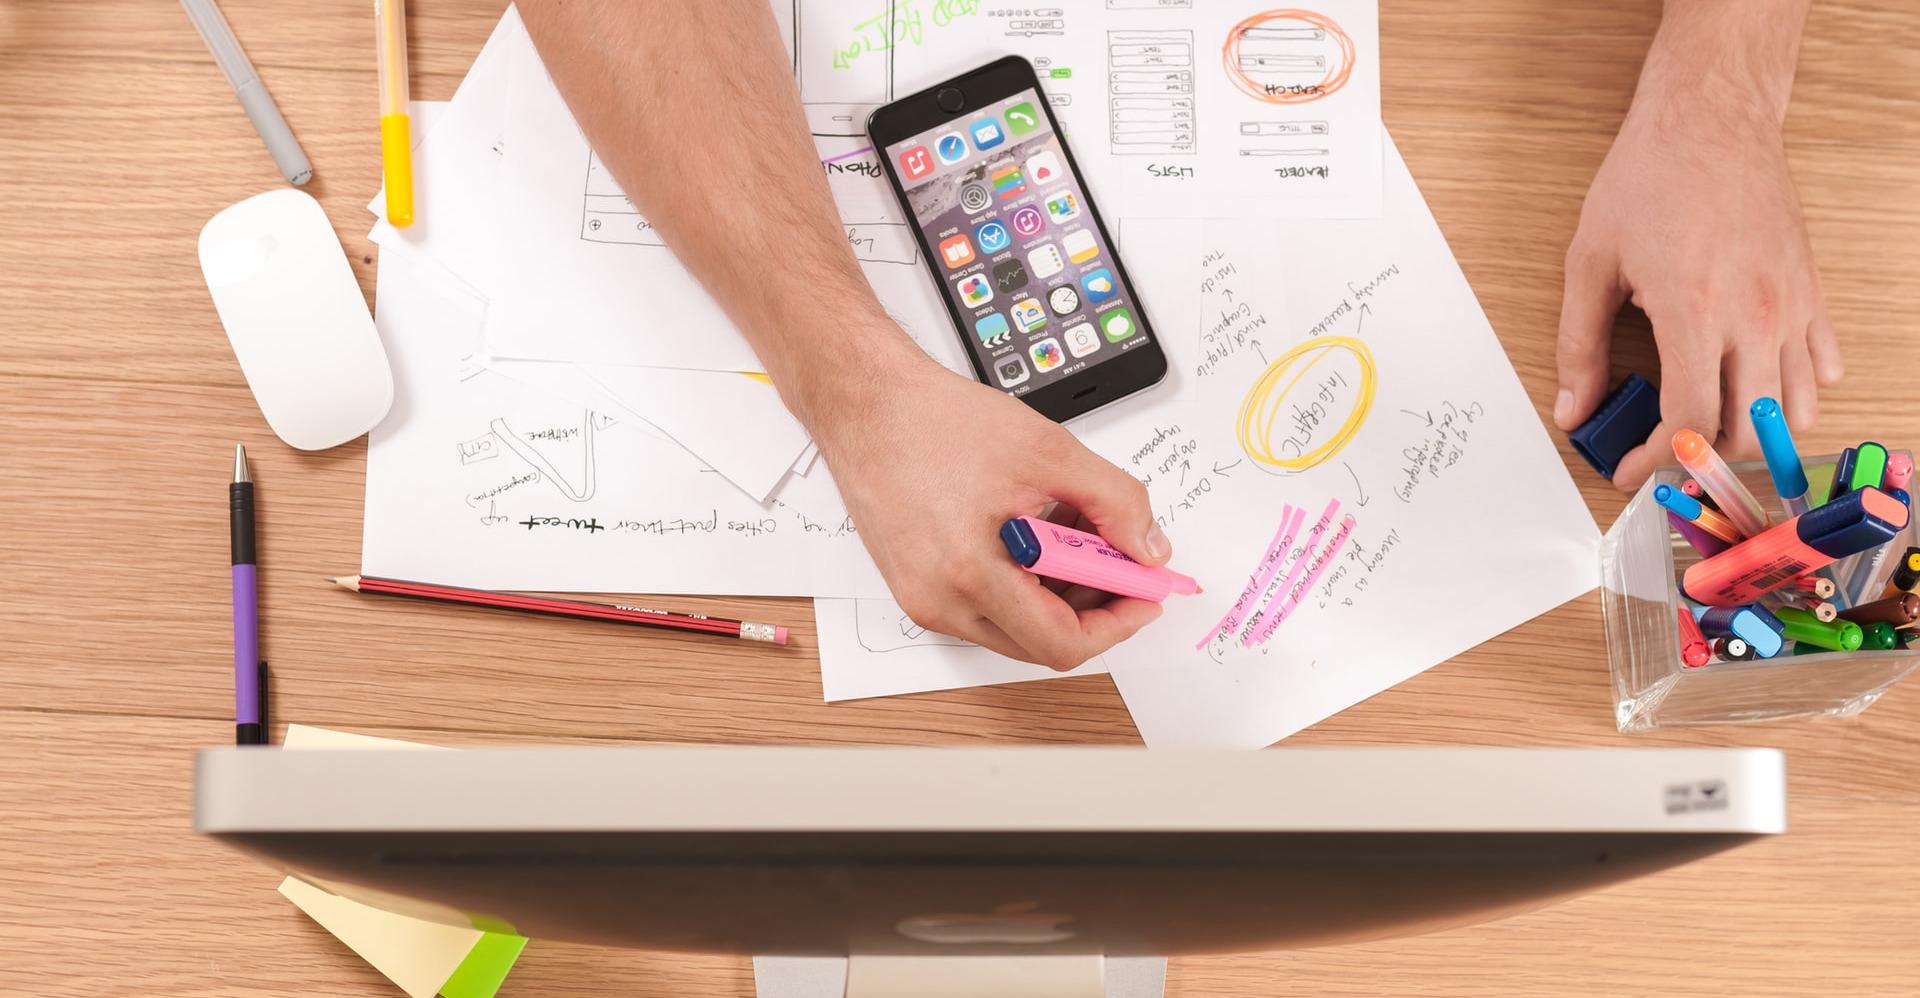 startup business plan for mobile app